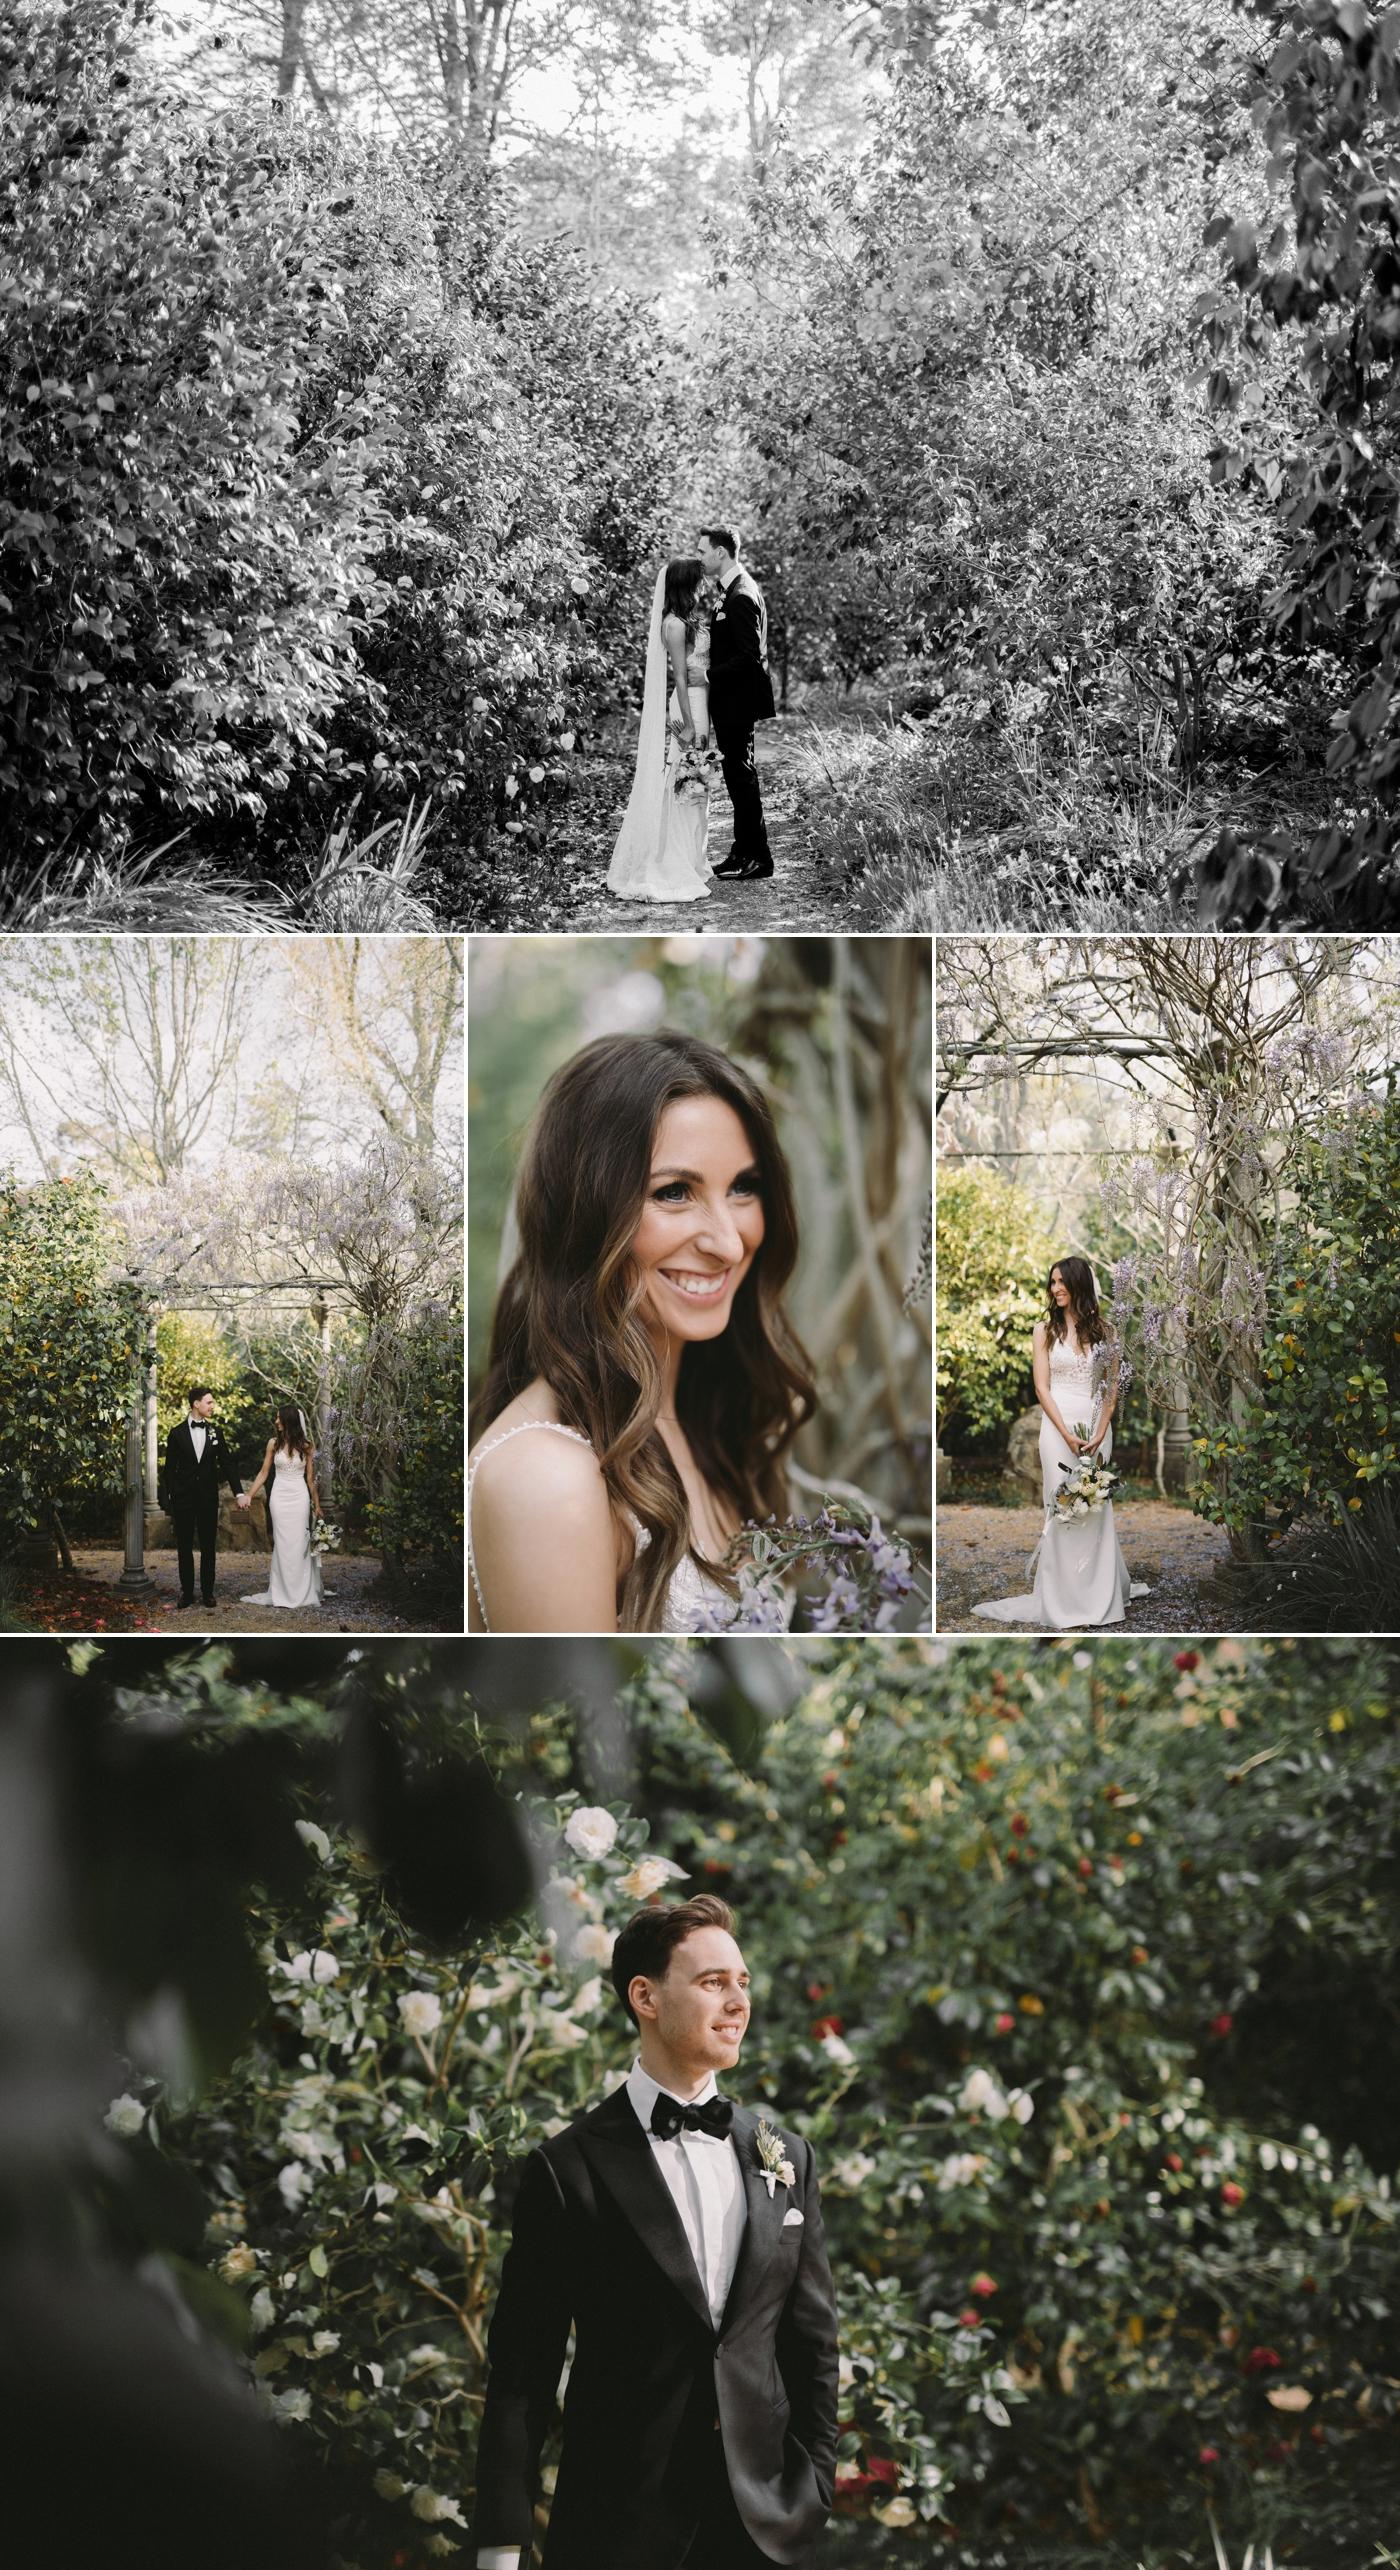 Katie and Ben - Natural Wedding Photography in Adelaide - Beautiful, Candid Wedding Photographer - Adelaide Hills Wedding - Katherine Schultz - www.katherineschultzphotography.com_0048.jpg